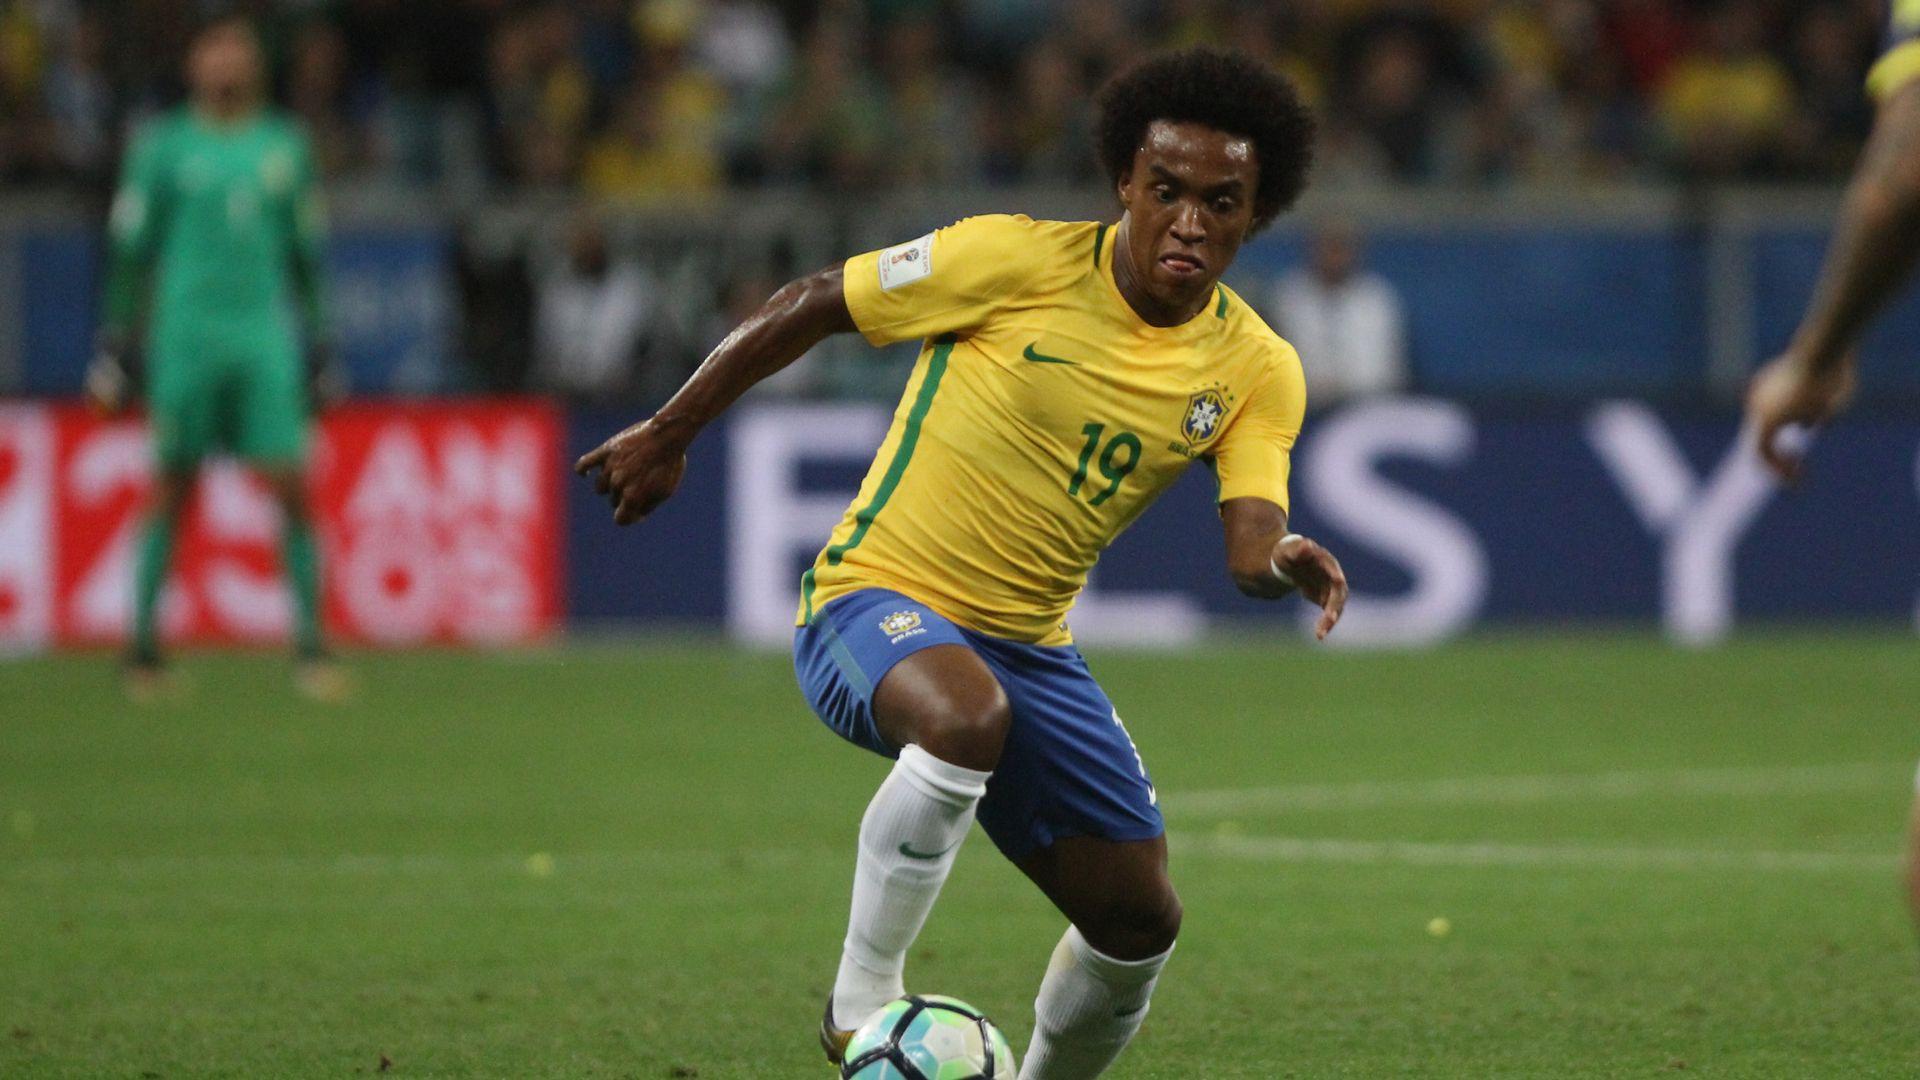 Willian Brazil Ecuador Eliminatorias 2018 31082017